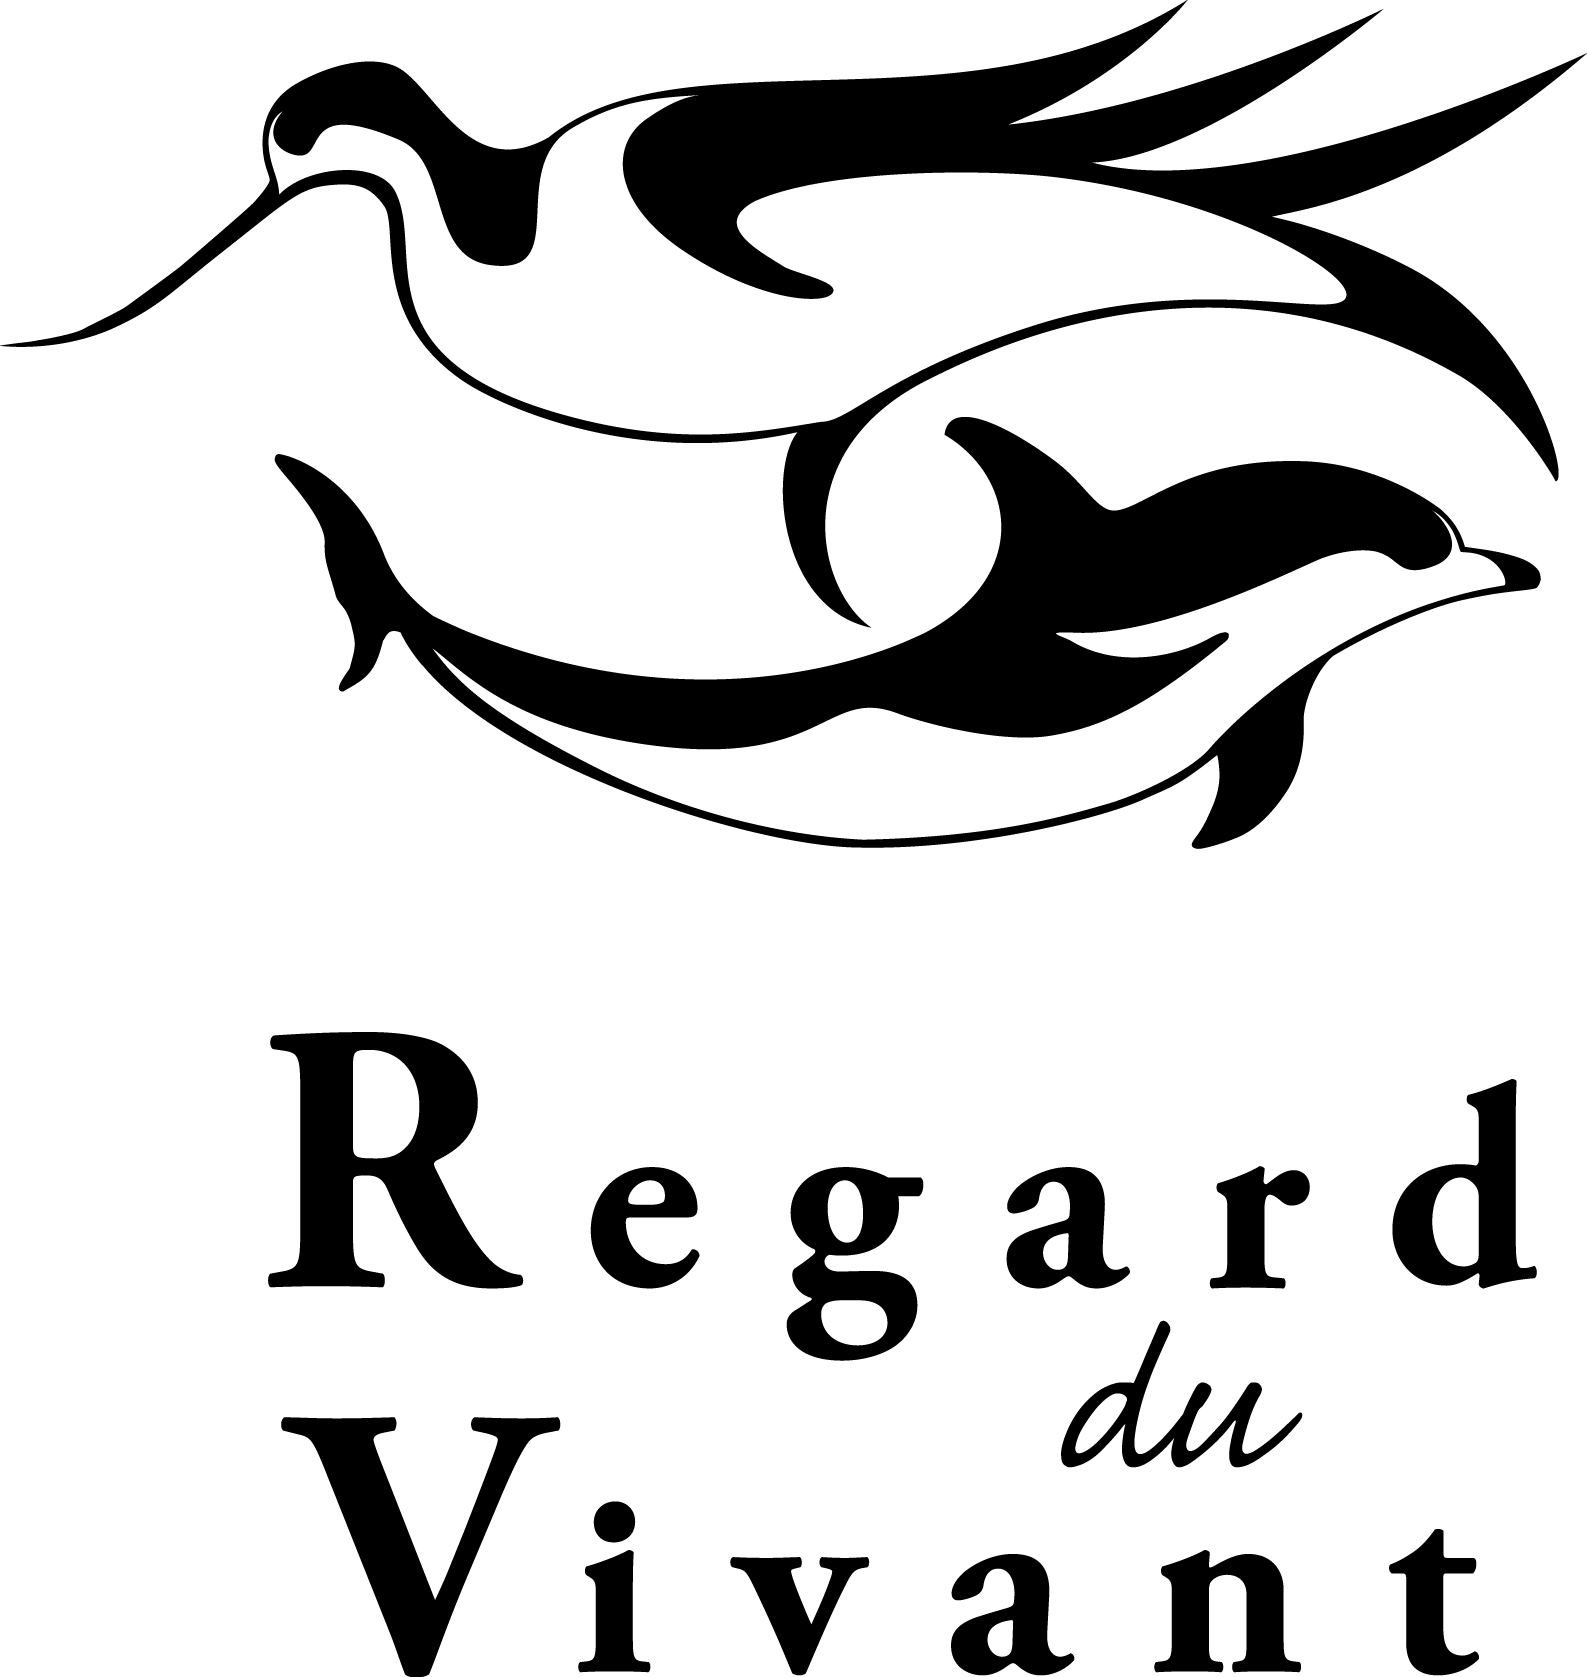 362_rdv-logo-2014-noir-100.jpg -